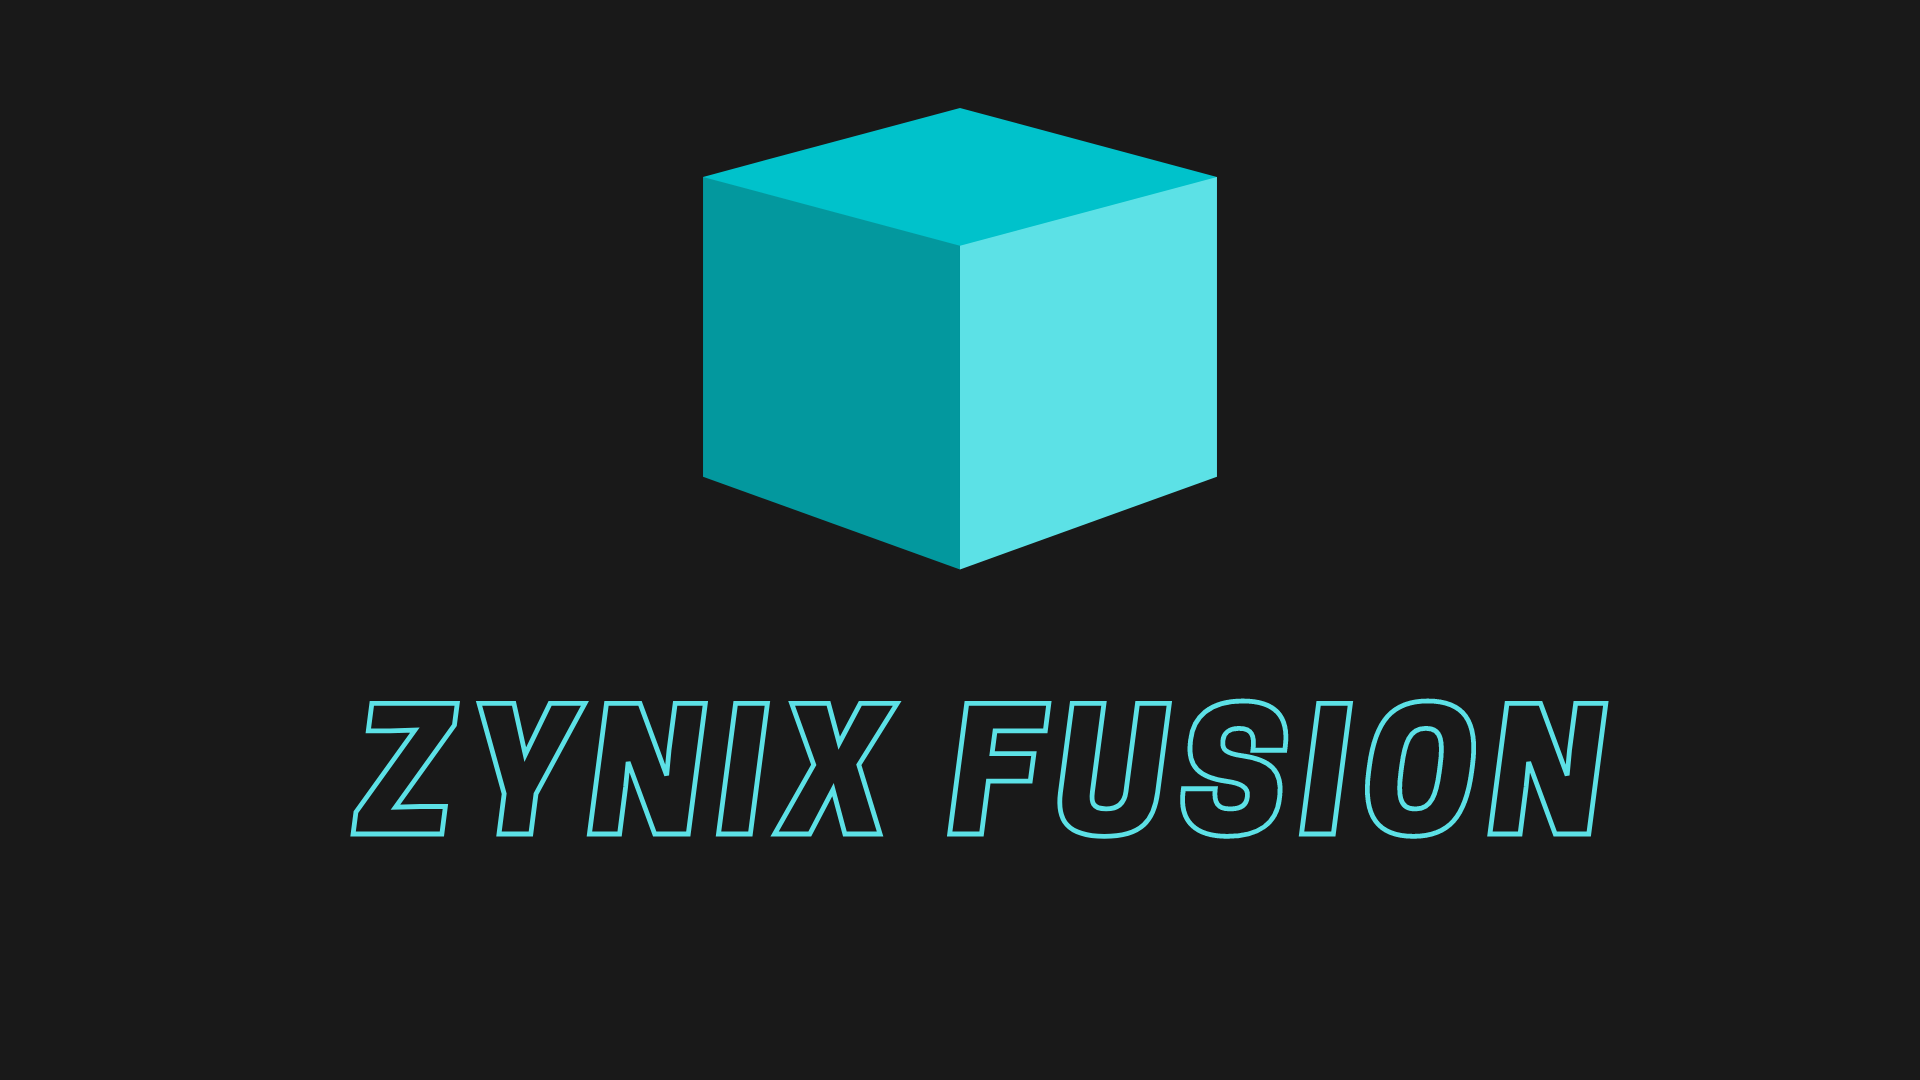 108415308 22907a80 720c 11eb 9b8e b3fb312ca86a - Zynix-fusion: Διάφορα εργαλεία ασφαλείας για pentesters